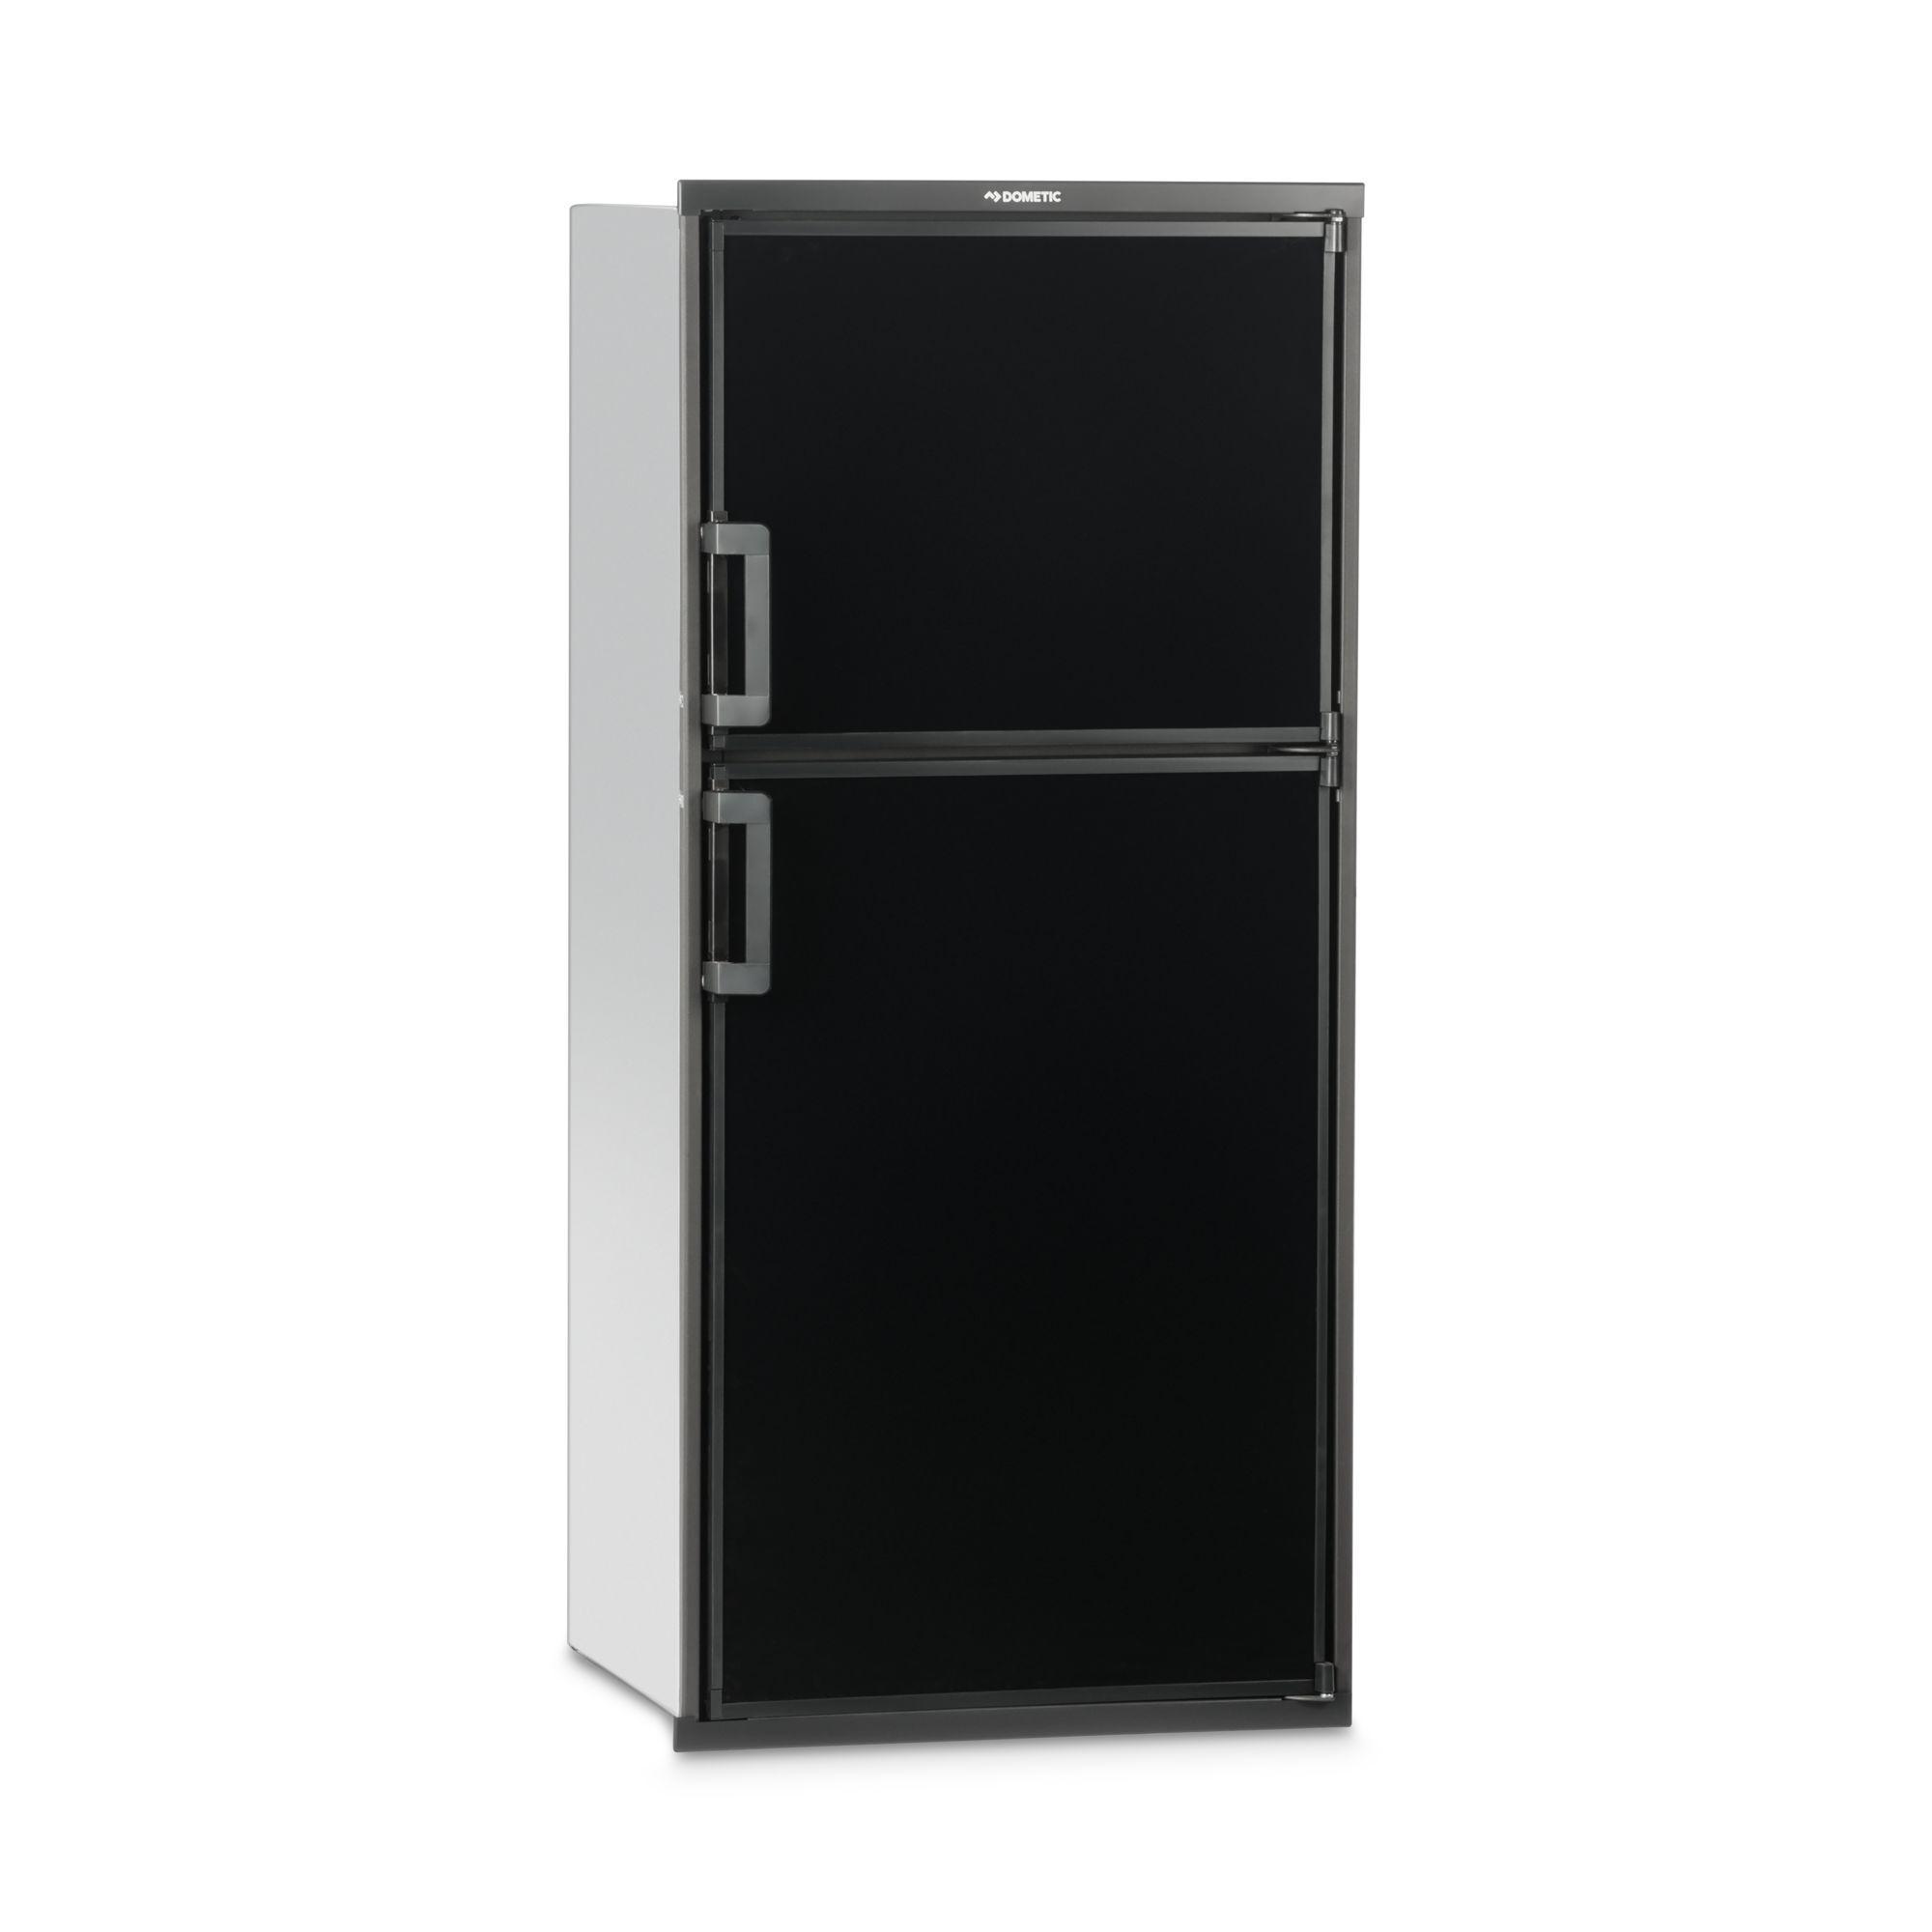 Dometic Americana II / Americana II Plus Refrigerator Door Panels, Black, Fits DM 2872/2882